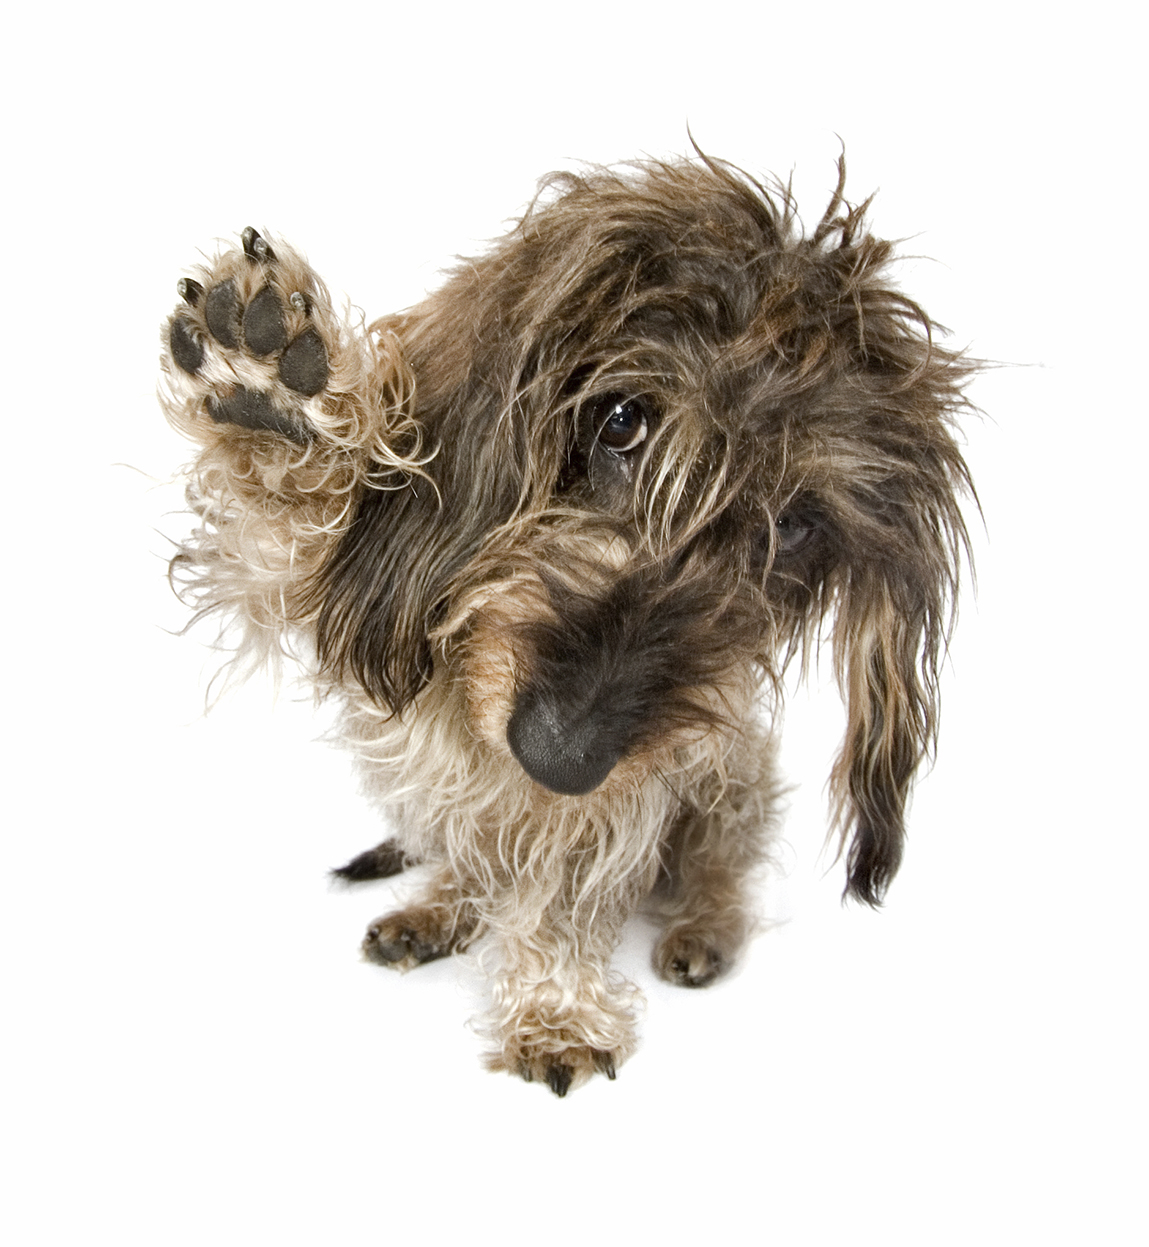 Canine Fun and Games! @ Marin Humane